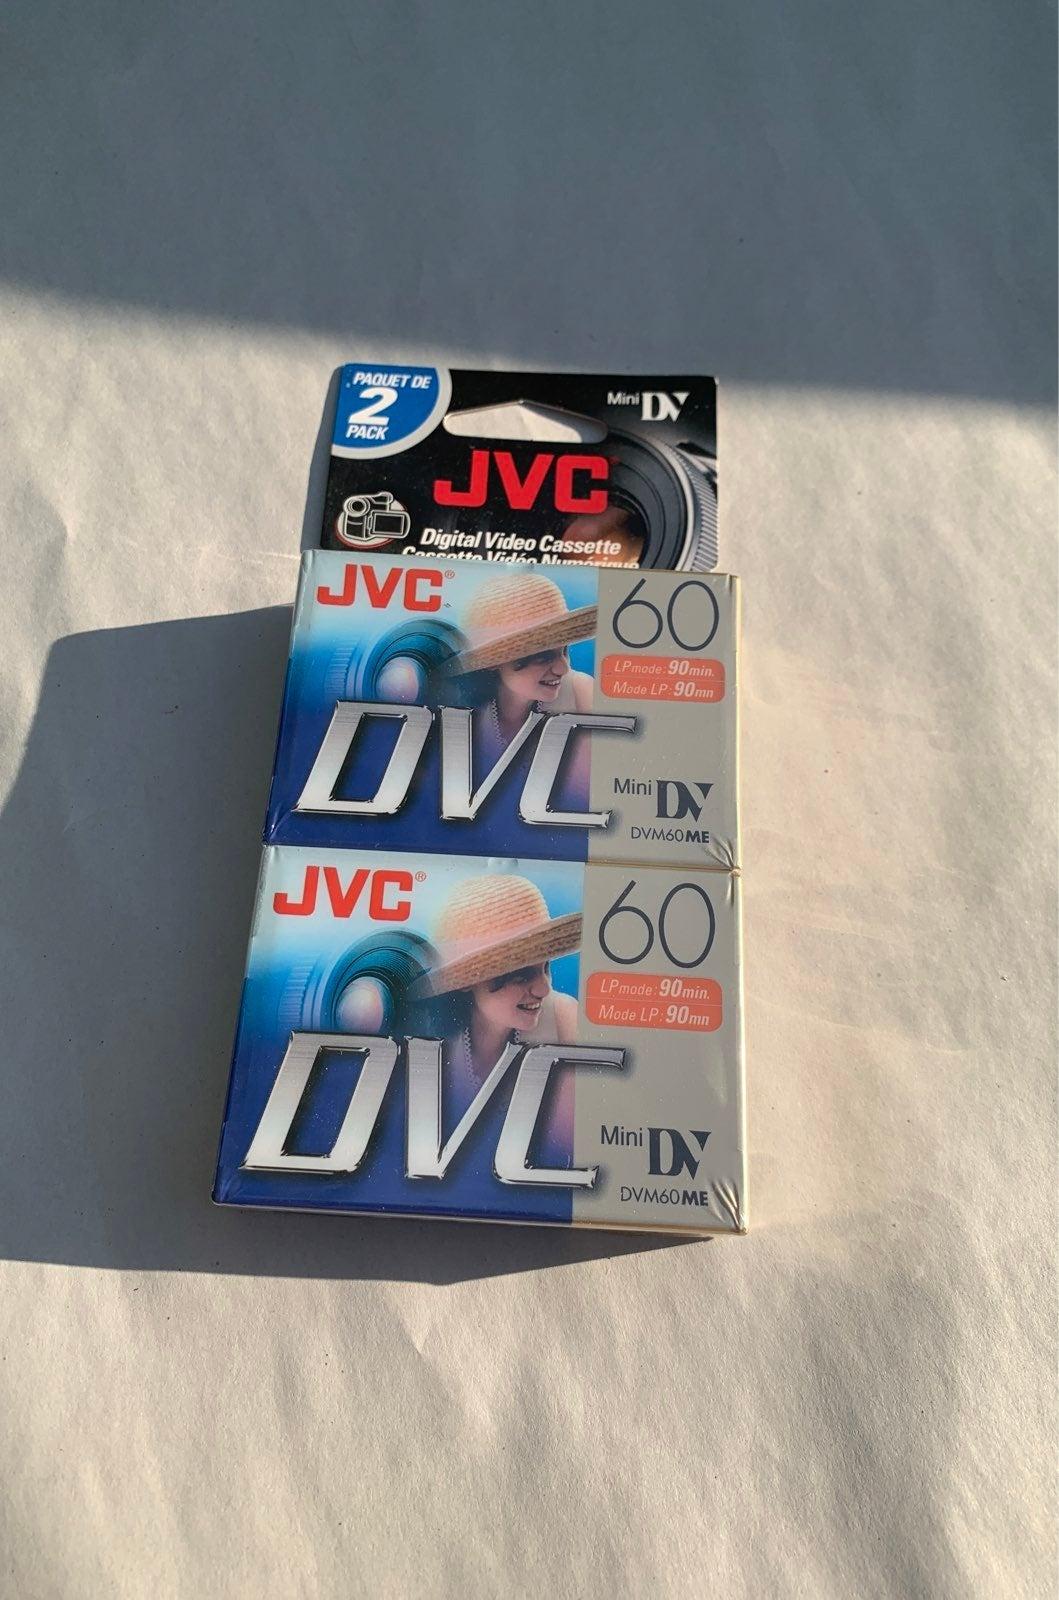 2 pack JVC DVC camcorder tapes